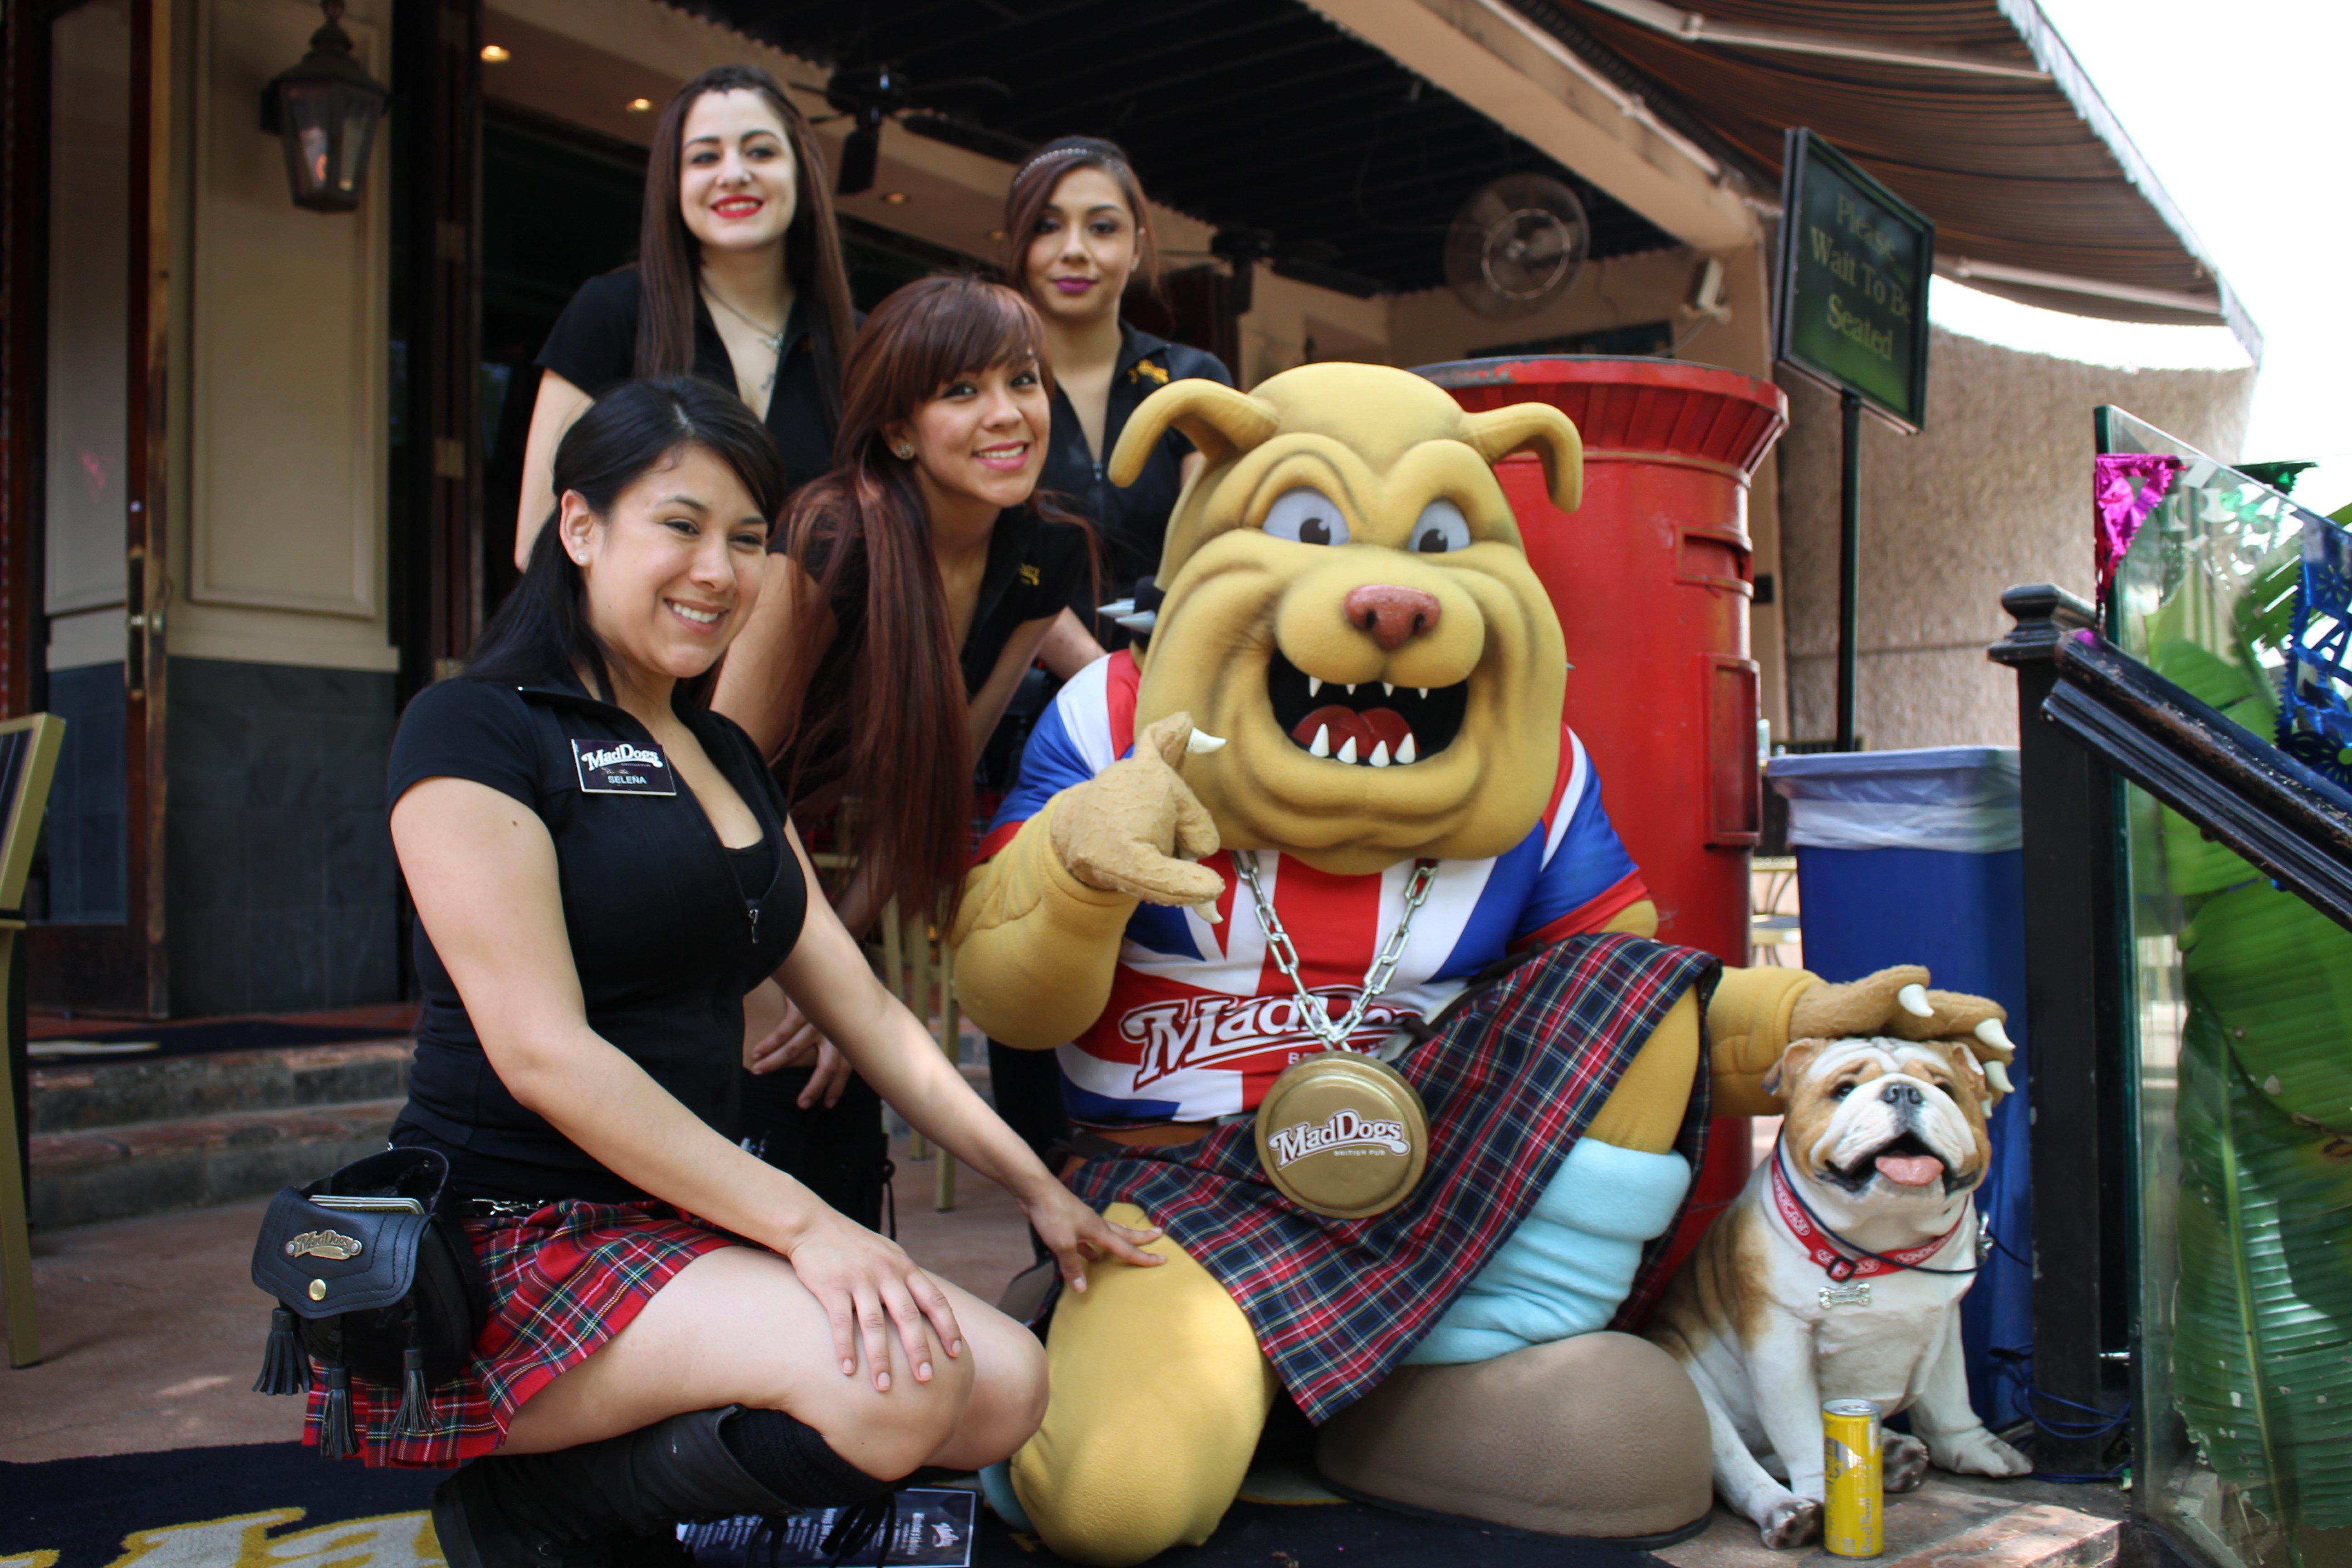 MadDogs British Pub Winston the Bulldog mascot